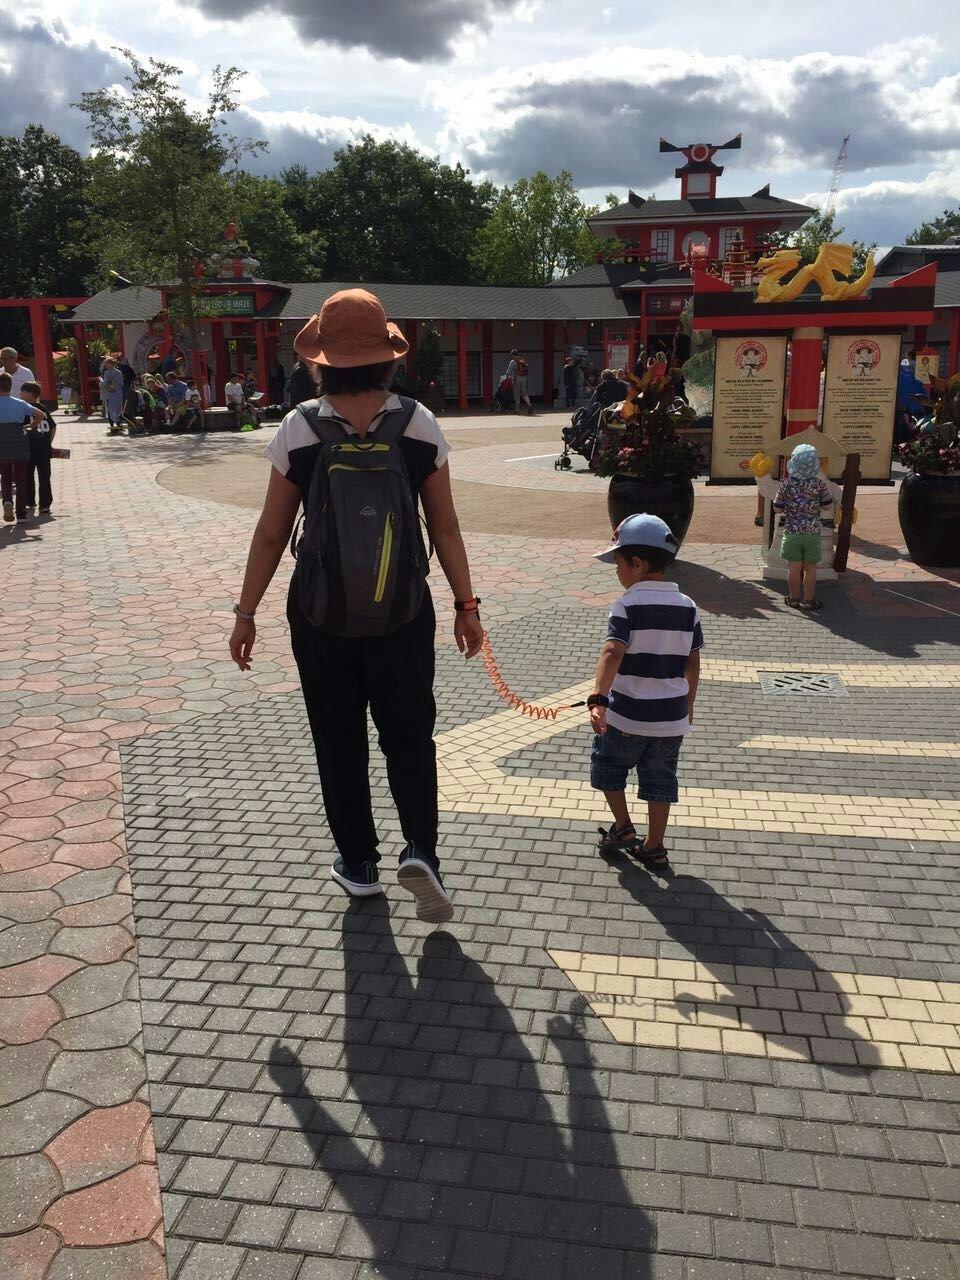 Anti-Lost Wrist, Ubwell Toddler Reins Safty Wrist Link Adjustable Wrist Link Walking Hand Belt for Children Kids Walking (Blue) Ubwell for life